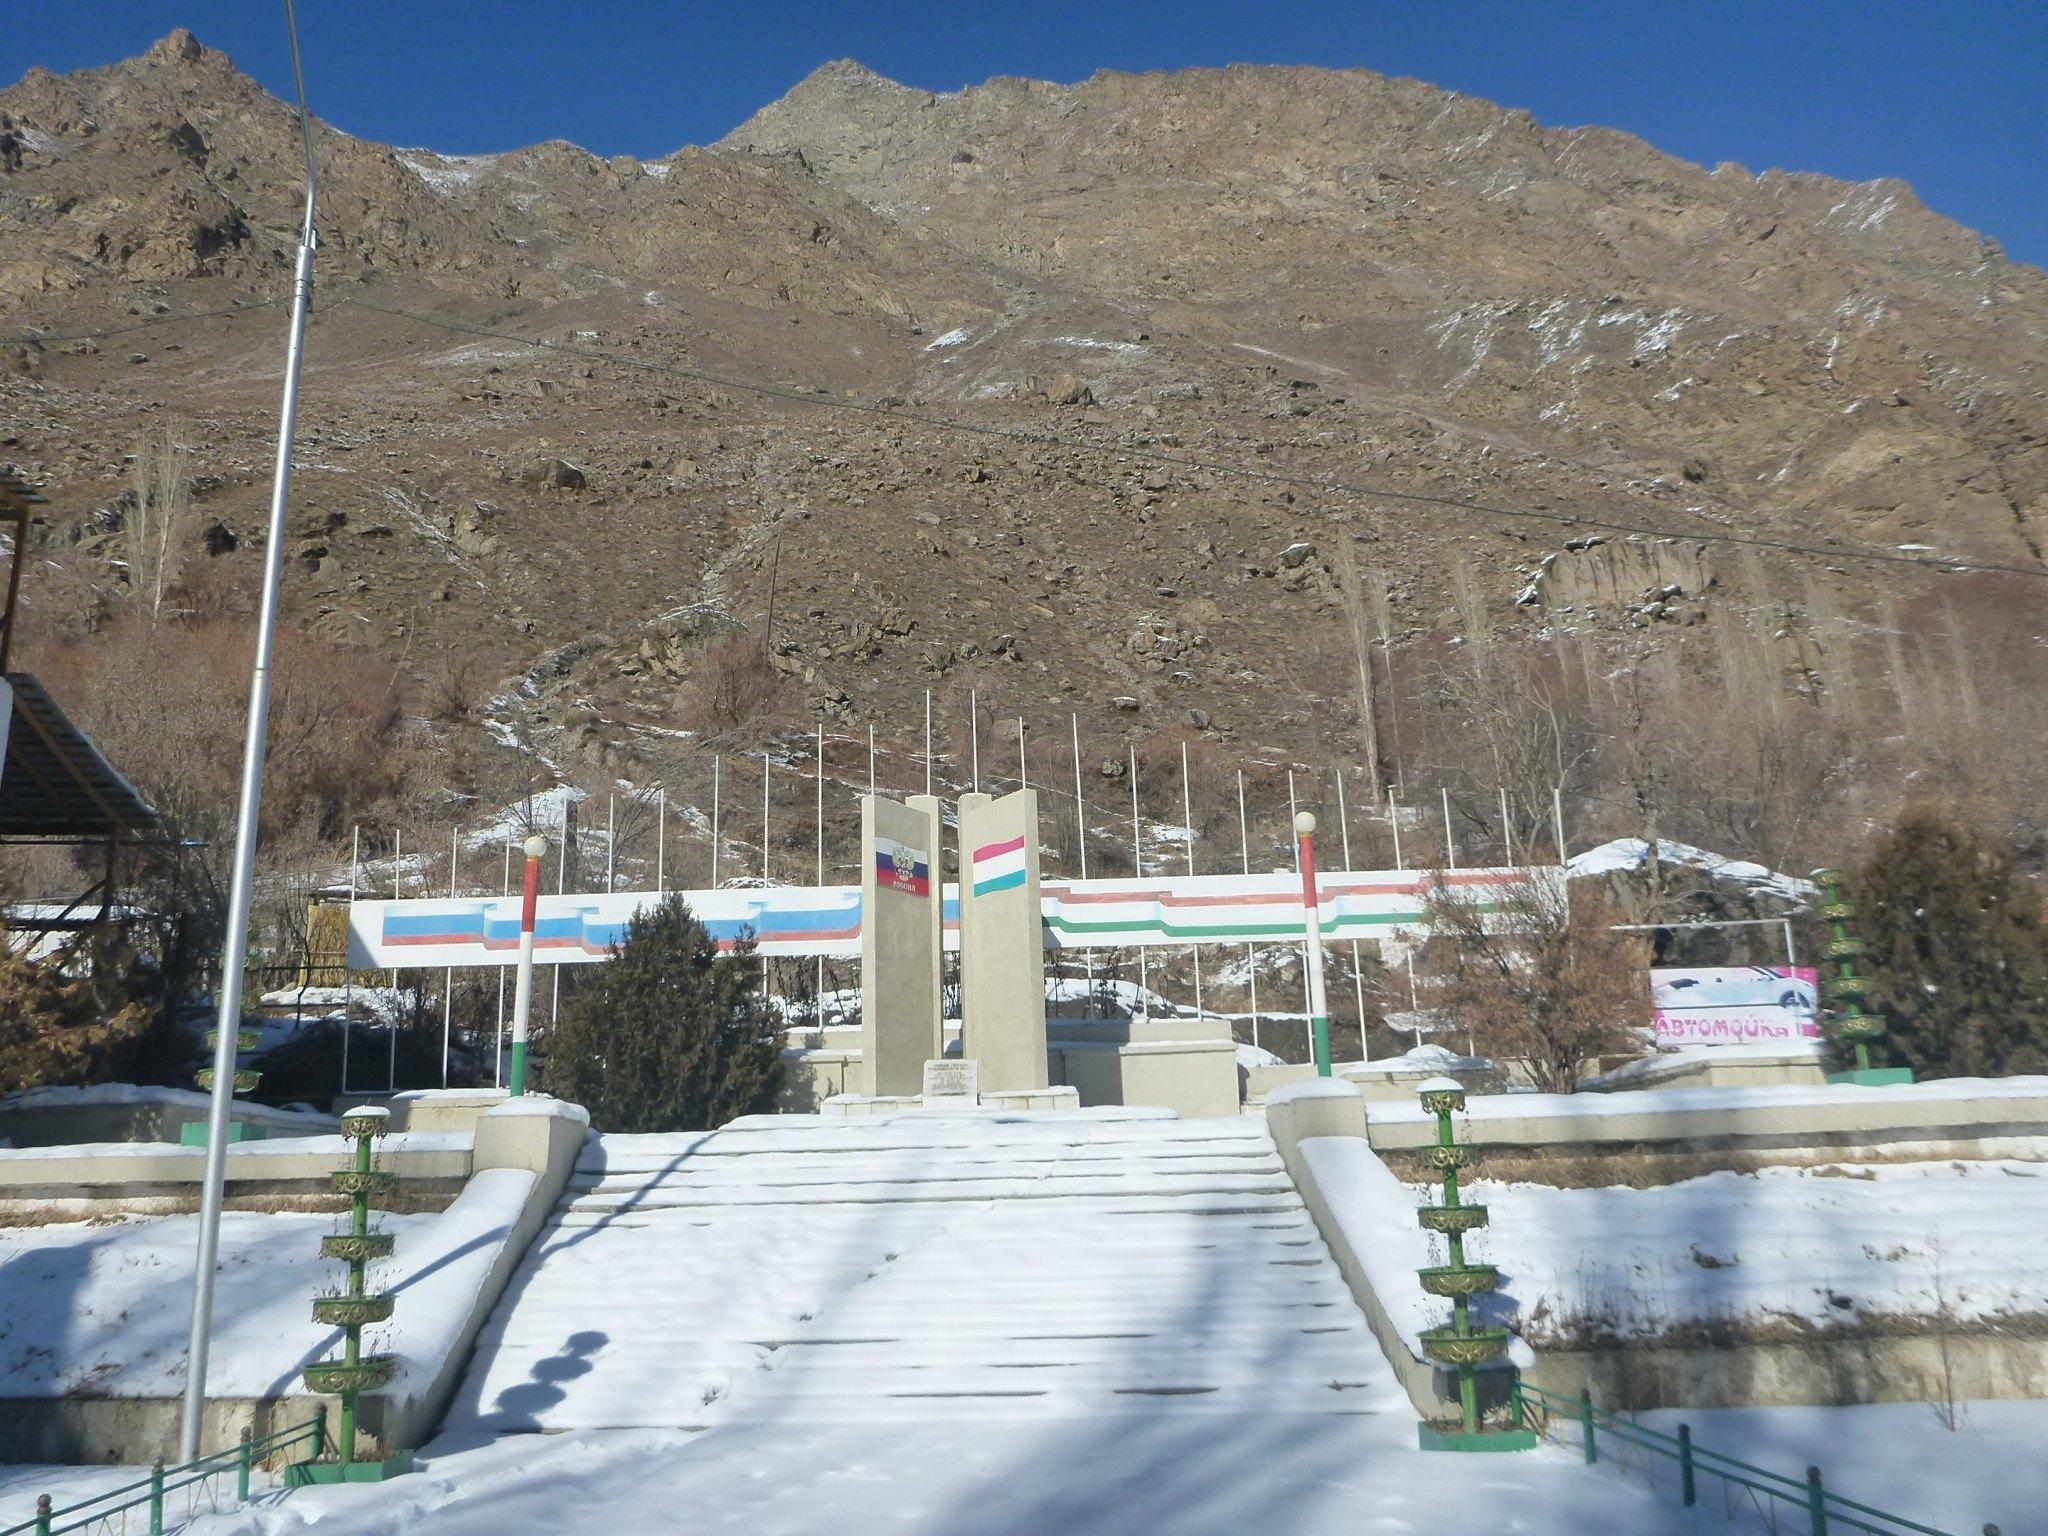 Backpacking in Gorno Badakhshan: Top 12 Sights in Khorog, Capital of the Pamirs